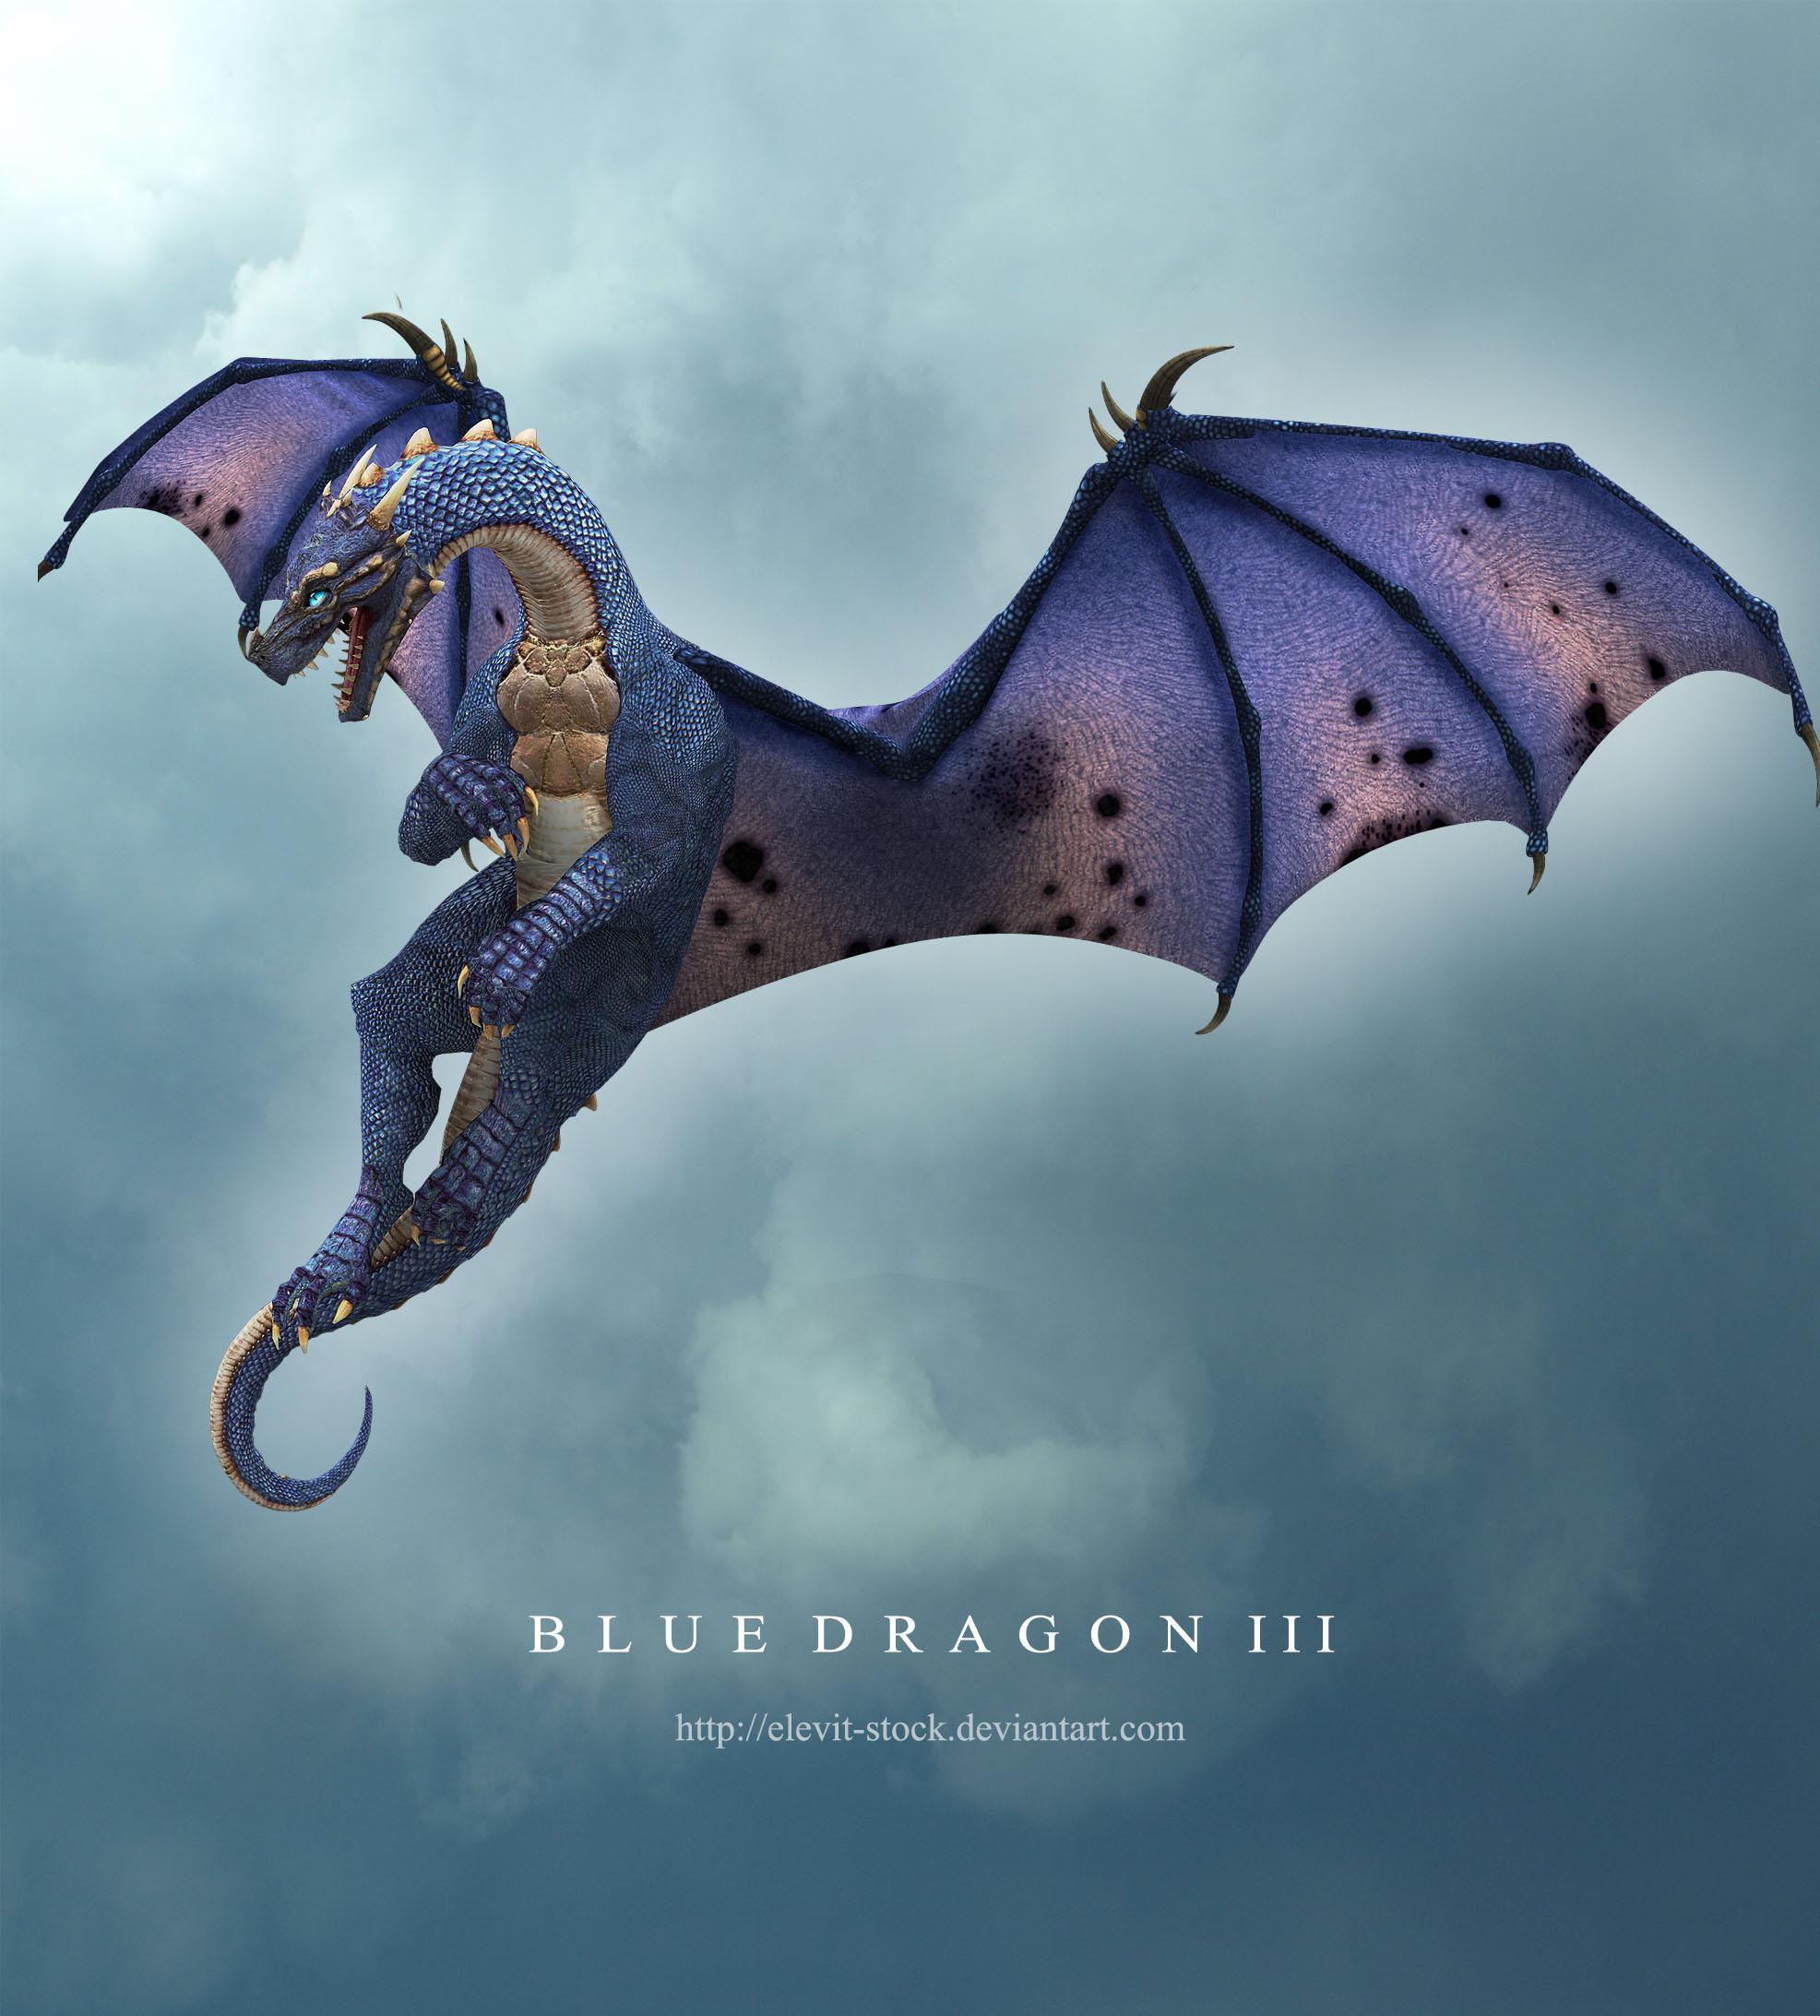 Blue Dragon III by Elevit-Stock